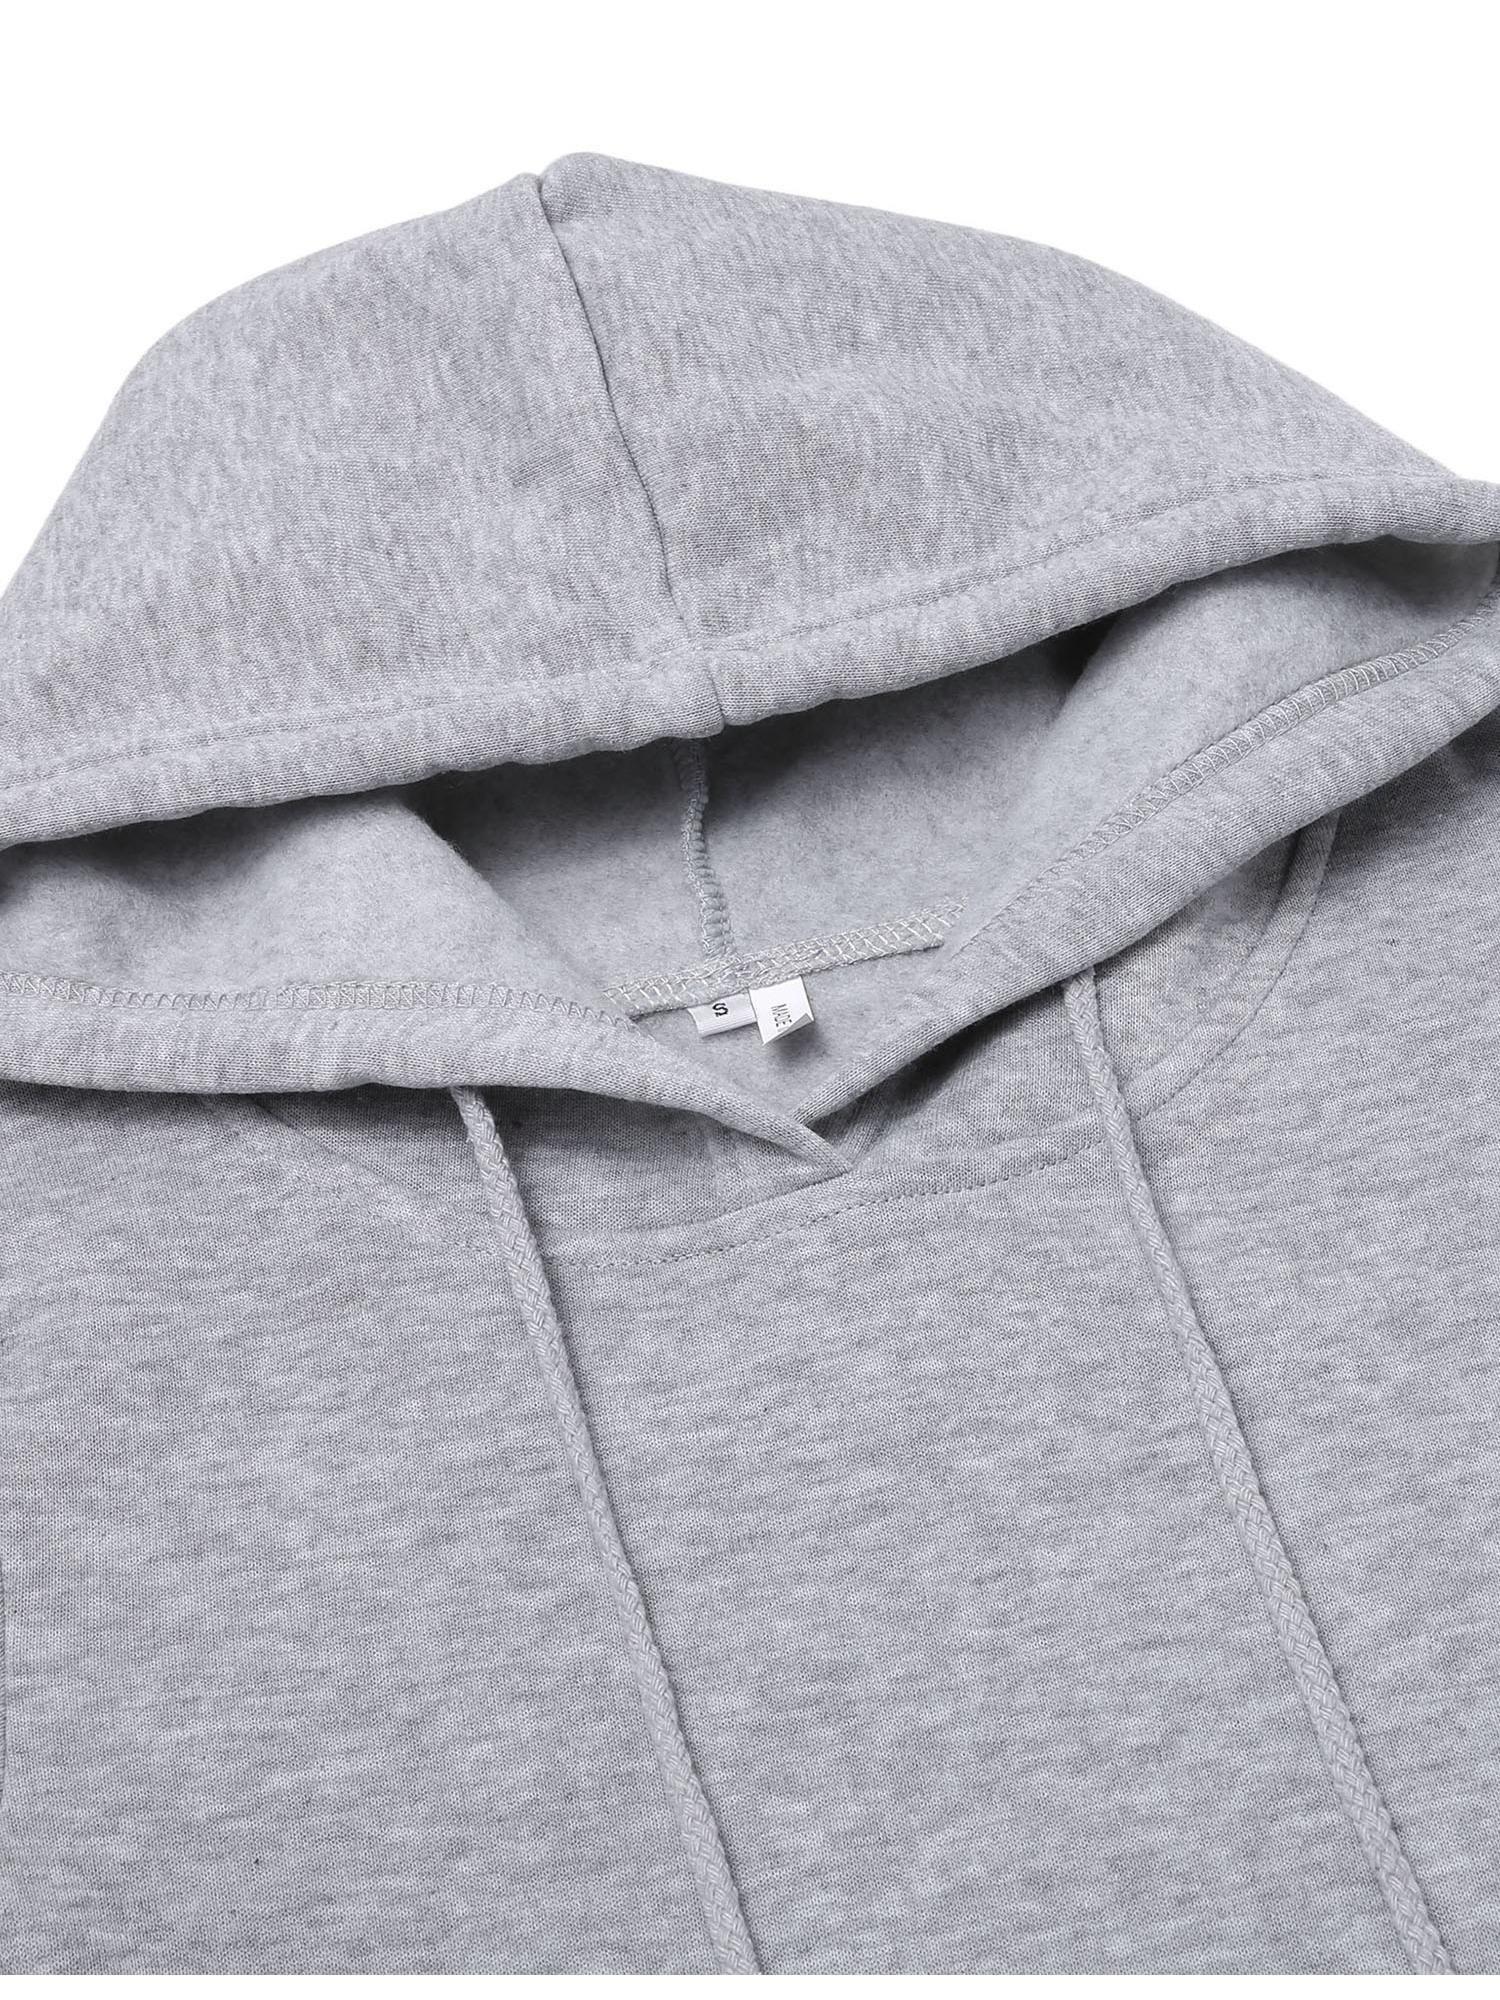 Women Fashion Slim Hooded Long Sleeve Solid Pencil Hoodie Dress Rllye Ad Hooded Affiliate Long Slim Long Sweatshirt Long Hoodie Sweatshirts Women [ 2000 x 1500 Pixel ]